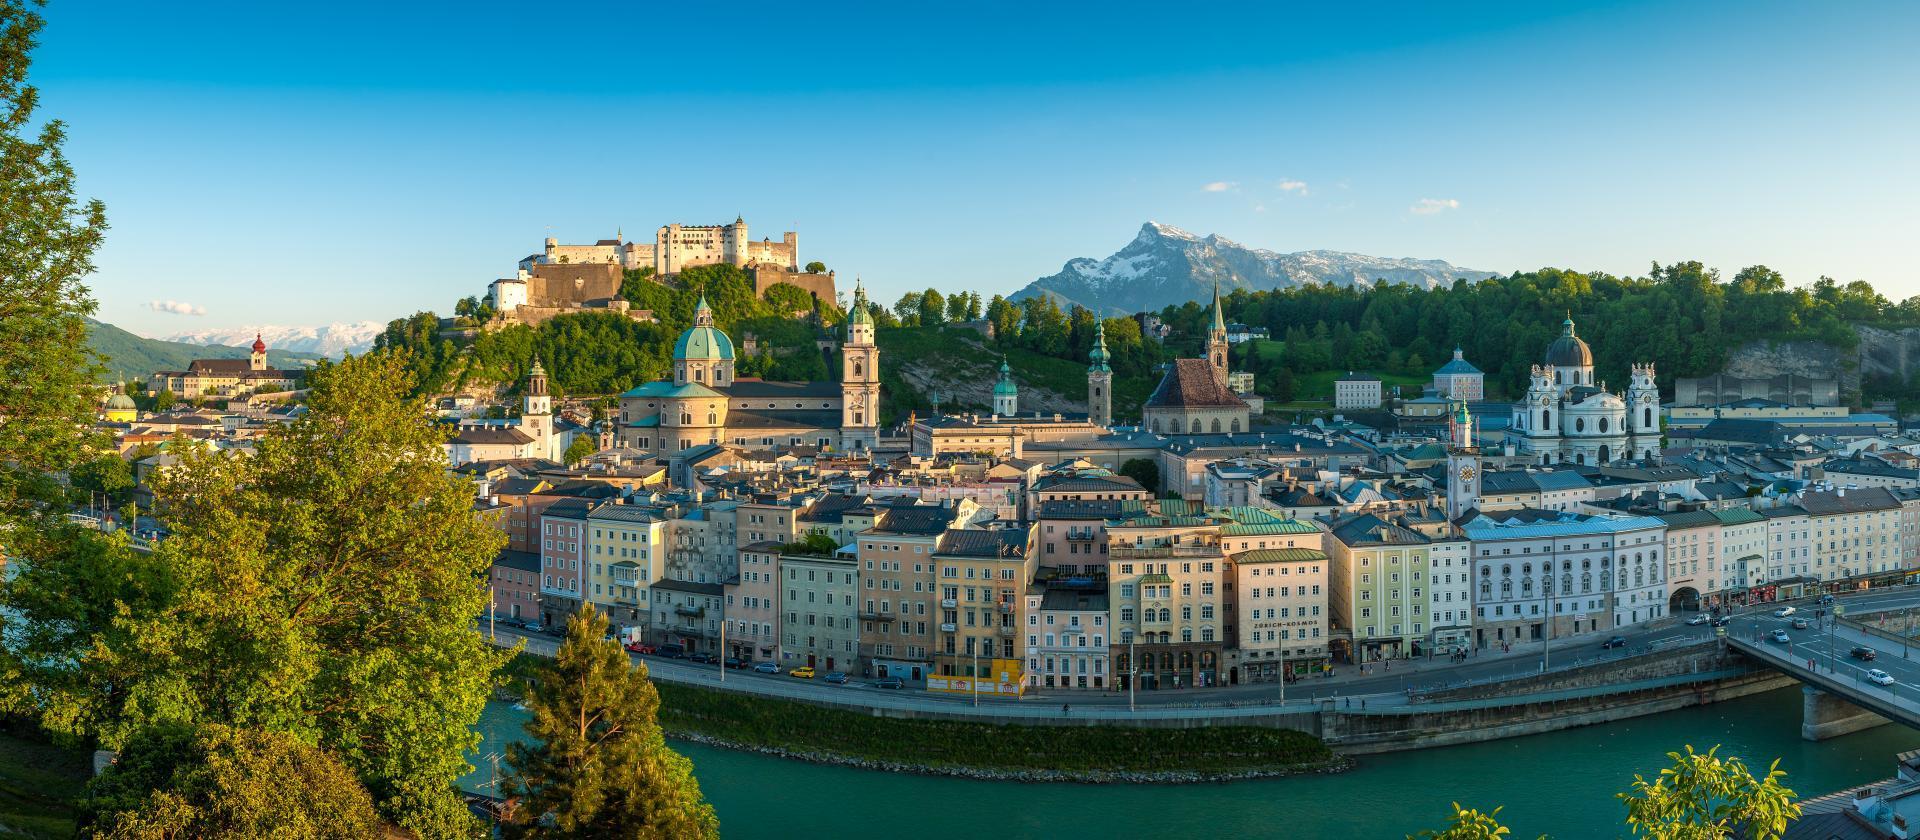 City of Salzburg